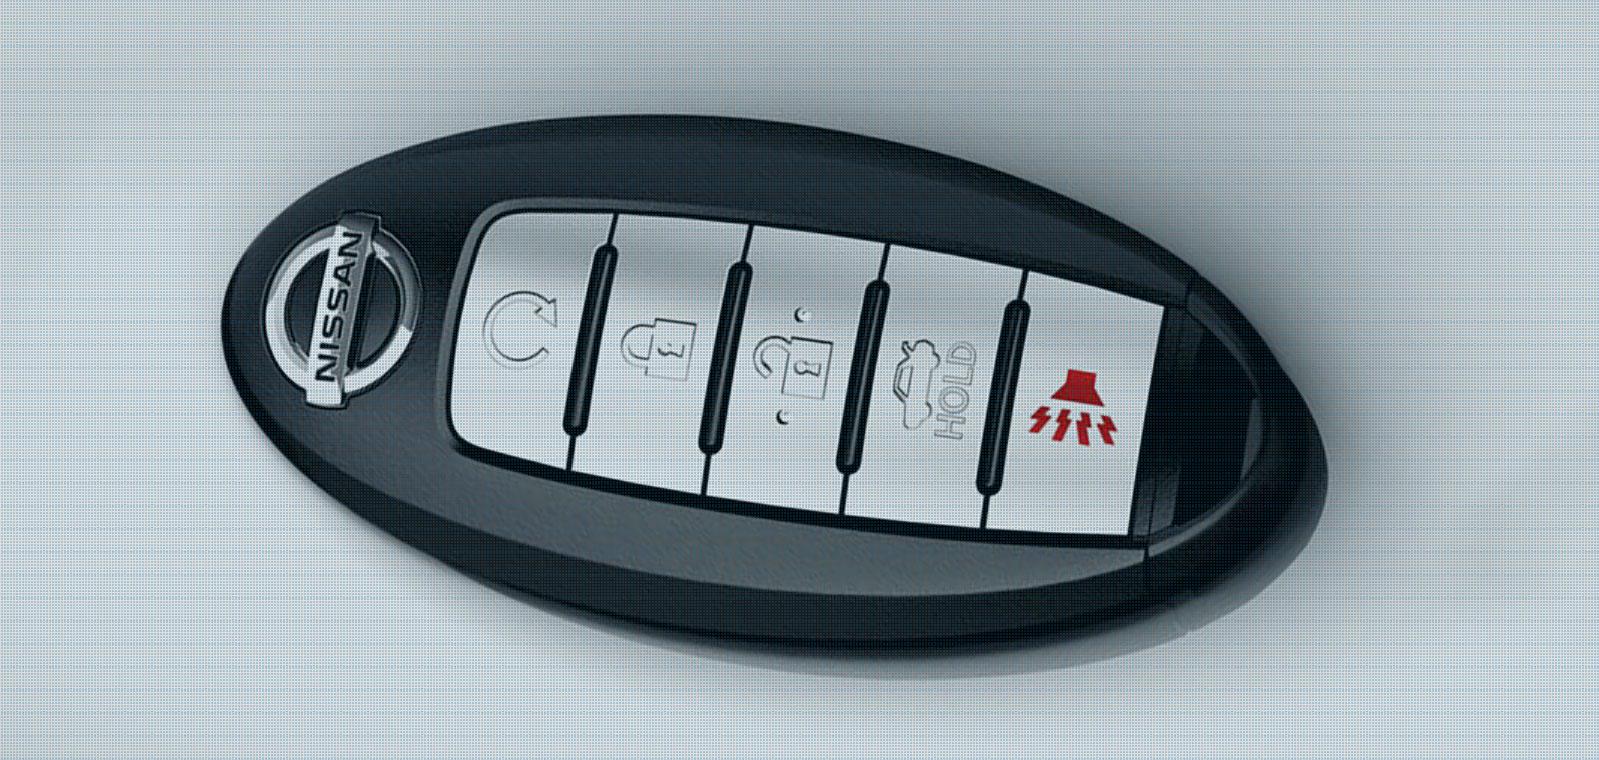 ford keyless remote programming instructions